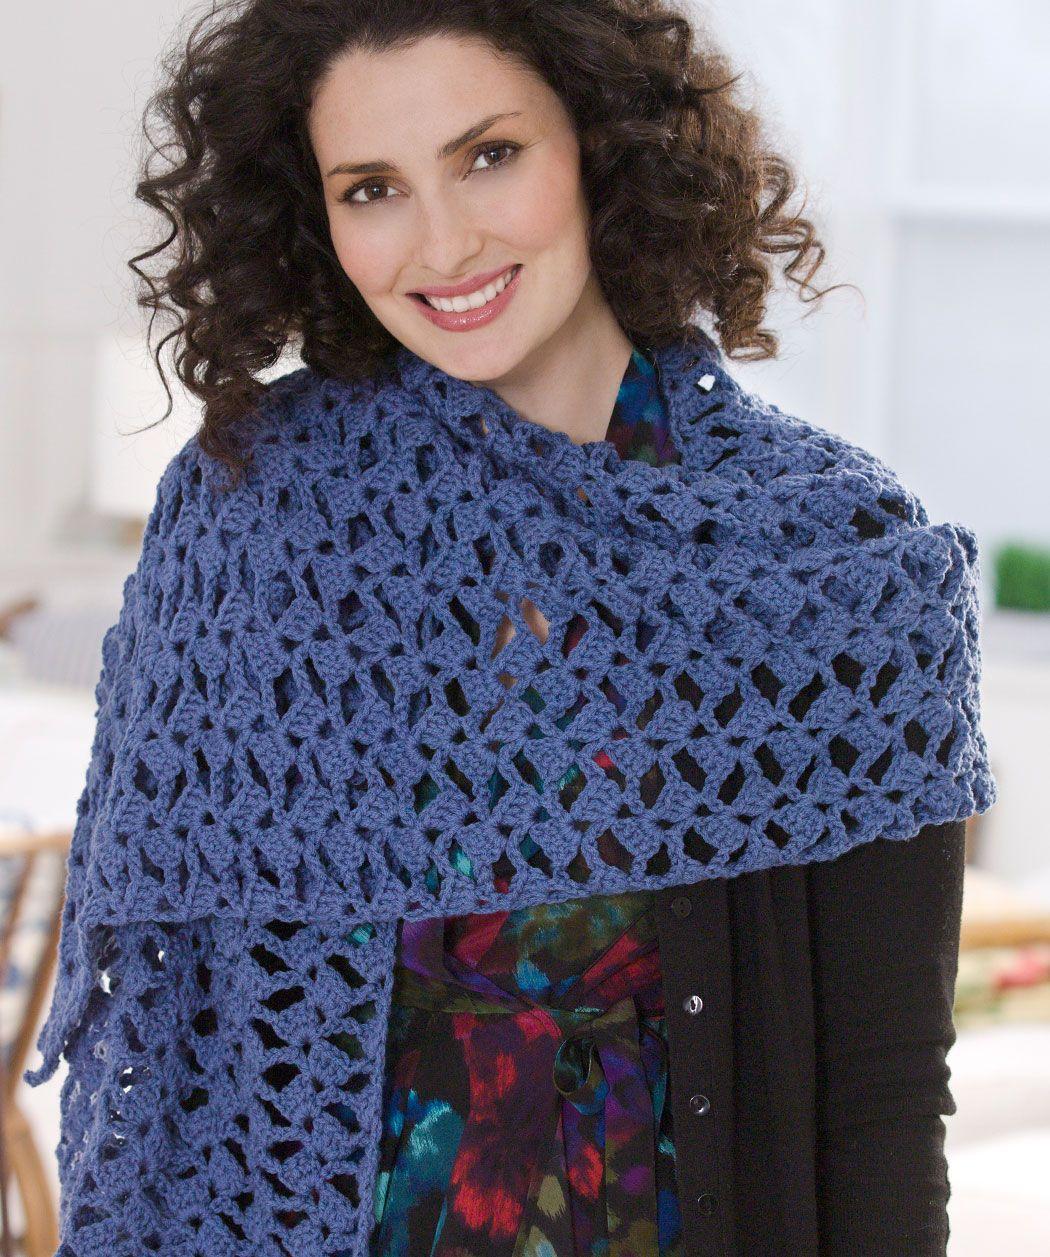 Romantic Lacy Shawl Crochet Pattern This amazing shawl ...